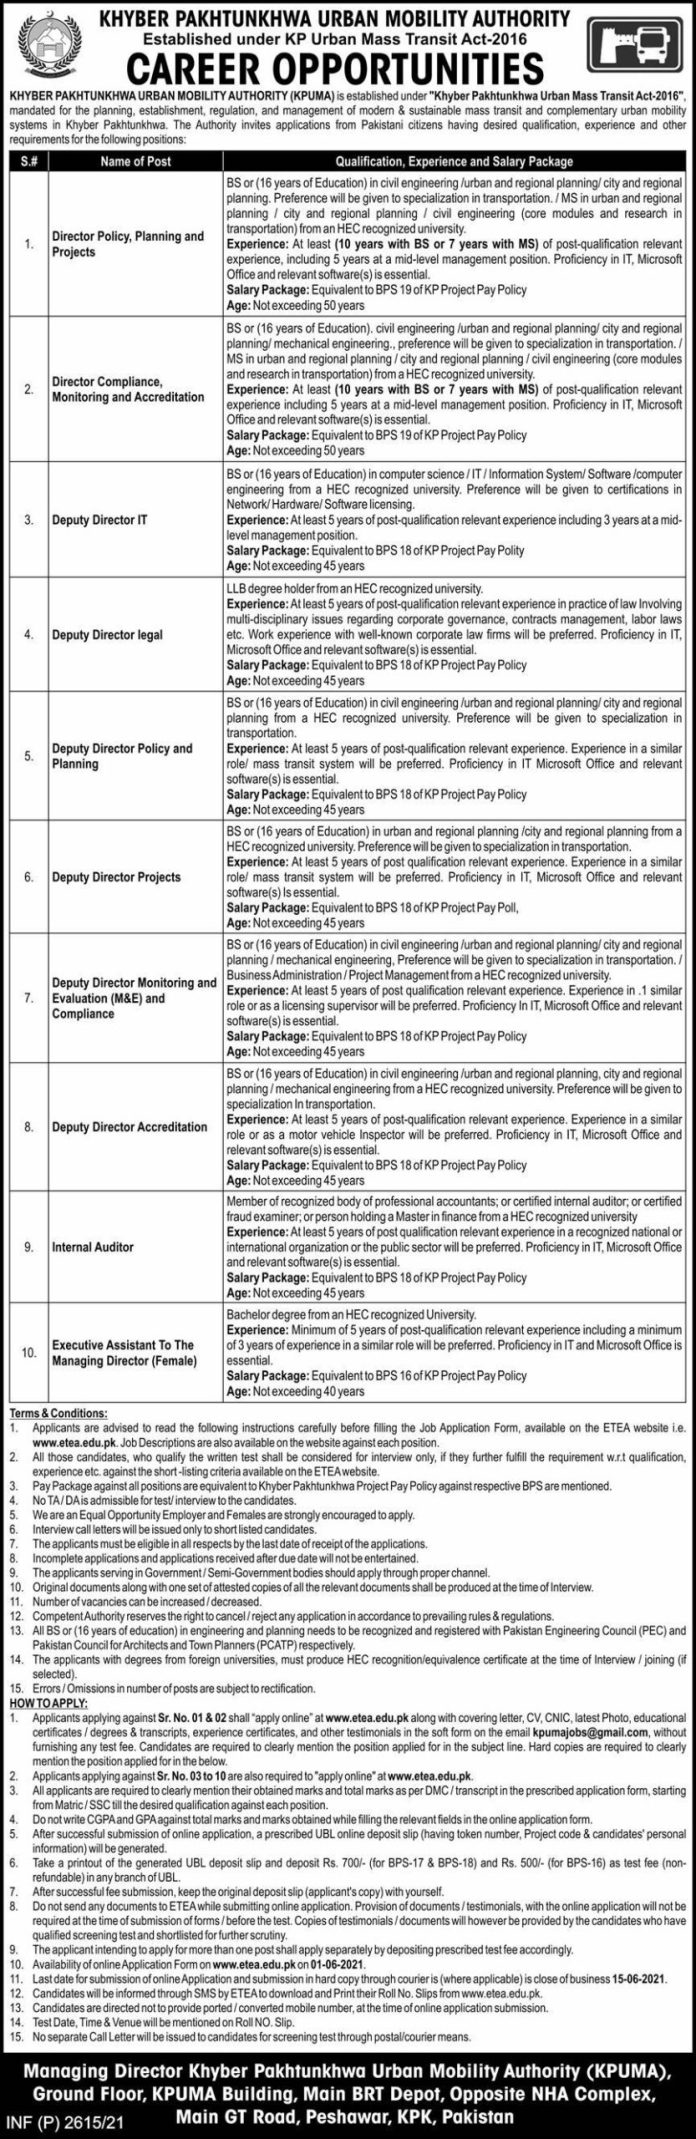 Khyber Pakhtunkhwa Urban Mobility Authority KPUMA Latest Jobs 2021